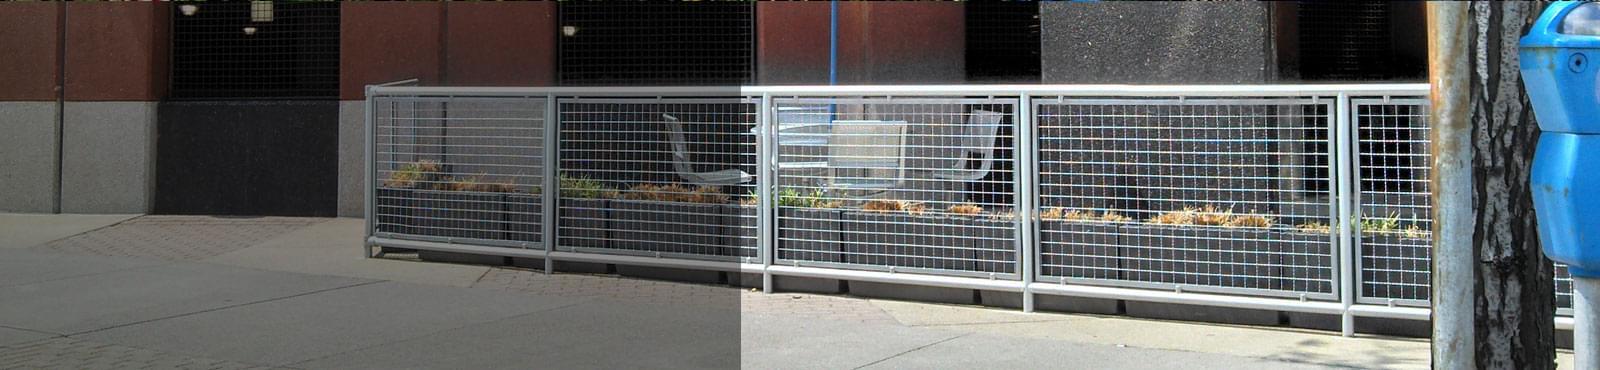 product-header-aluminum-handrail